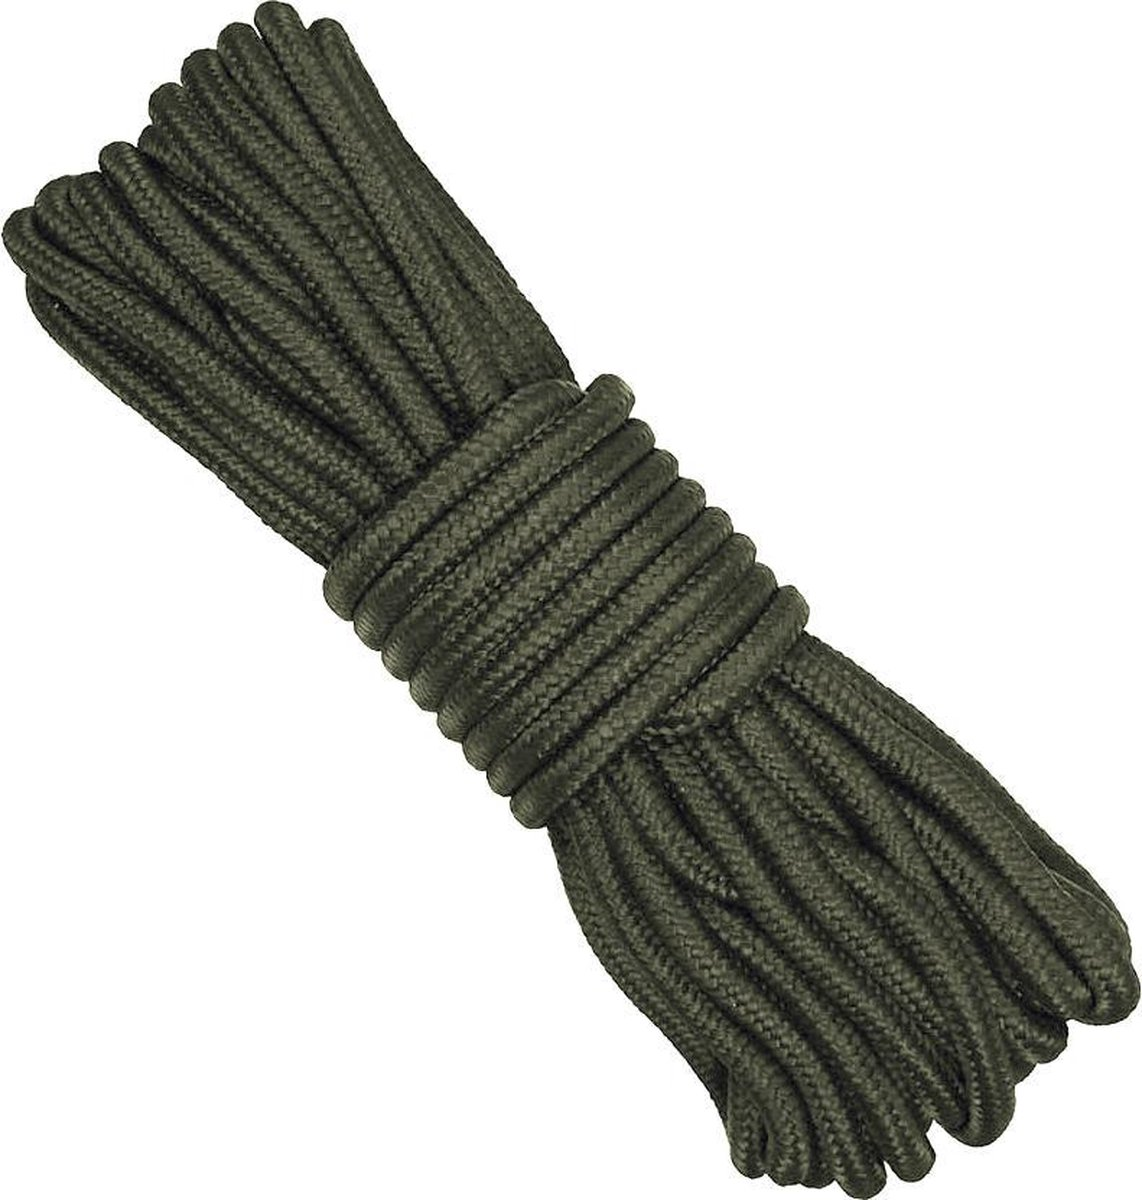 Fosco Paracord - Groen - 15m - 9mm